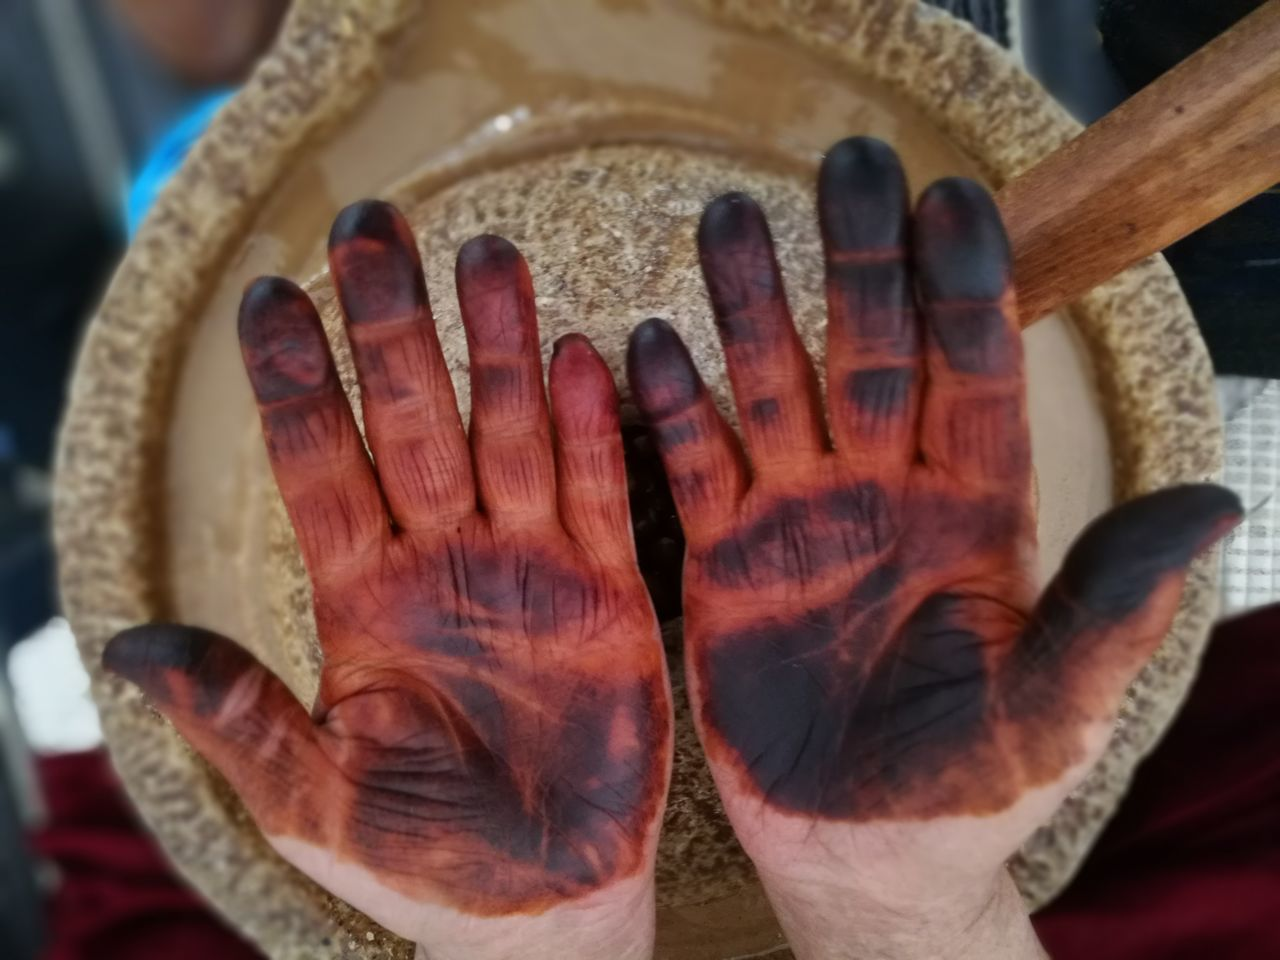 Processing argan seeds Argan ArganOil Berber  Cosmetic Fatigue  Food Hand Handmade Hands Hands At Work Healthy Marocco Nut Nuts Oil Processing Traditional